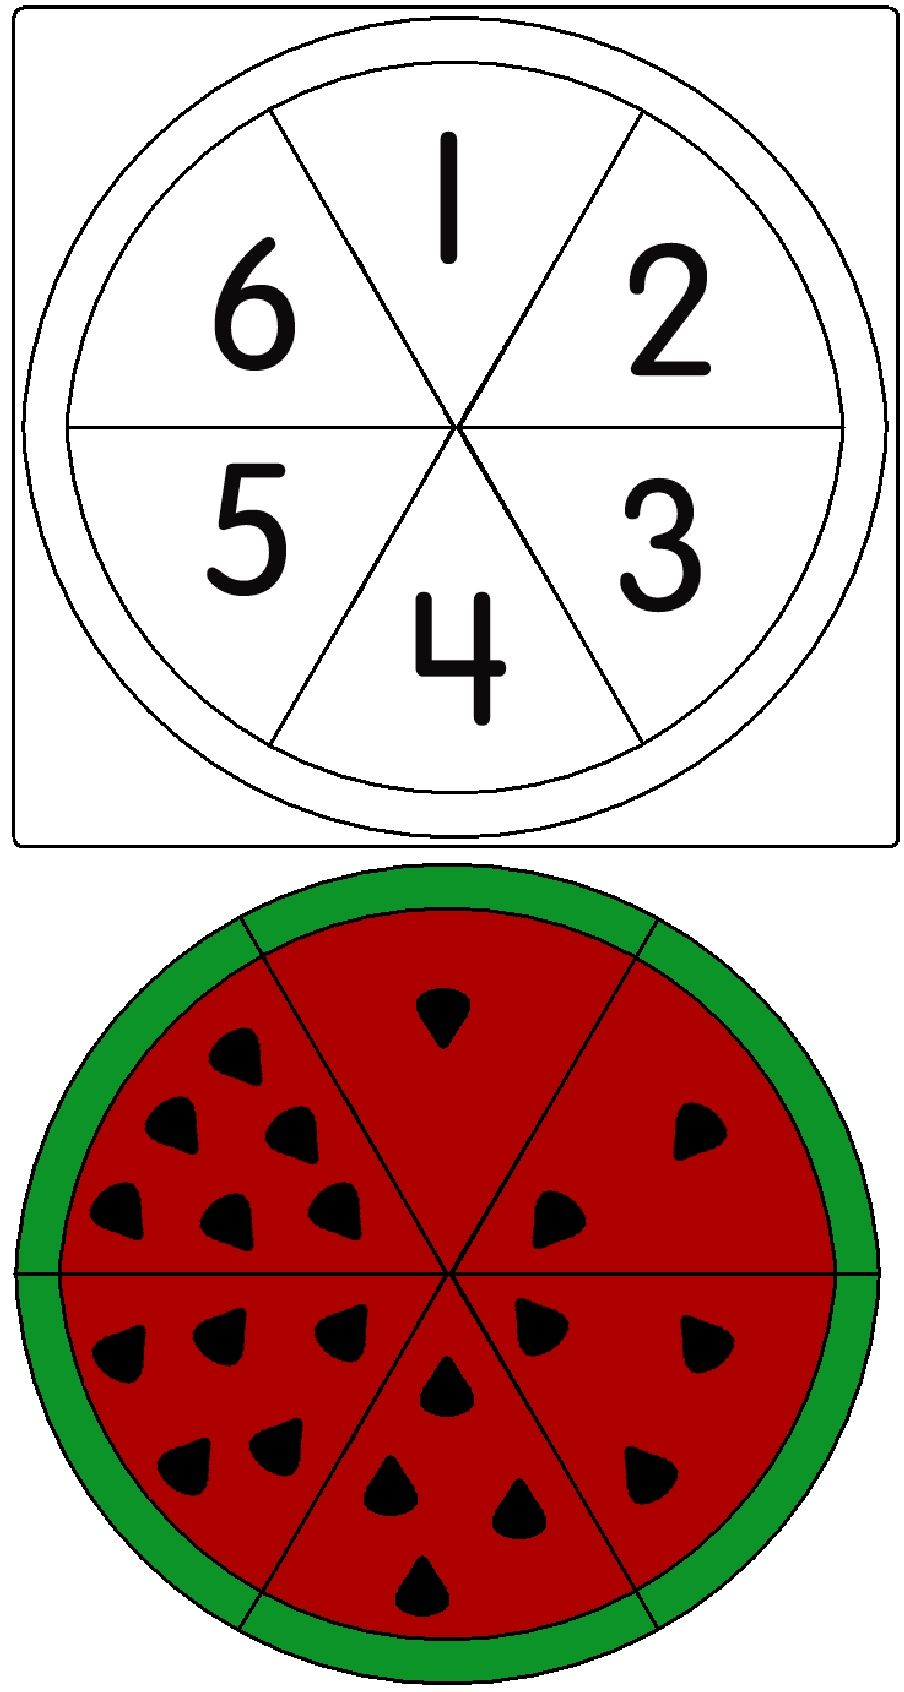 Watermelon Game Math Activities Preschool Preschool Learning Activities Kids Math Worksheets [ 1692 x 904 Pixel ]